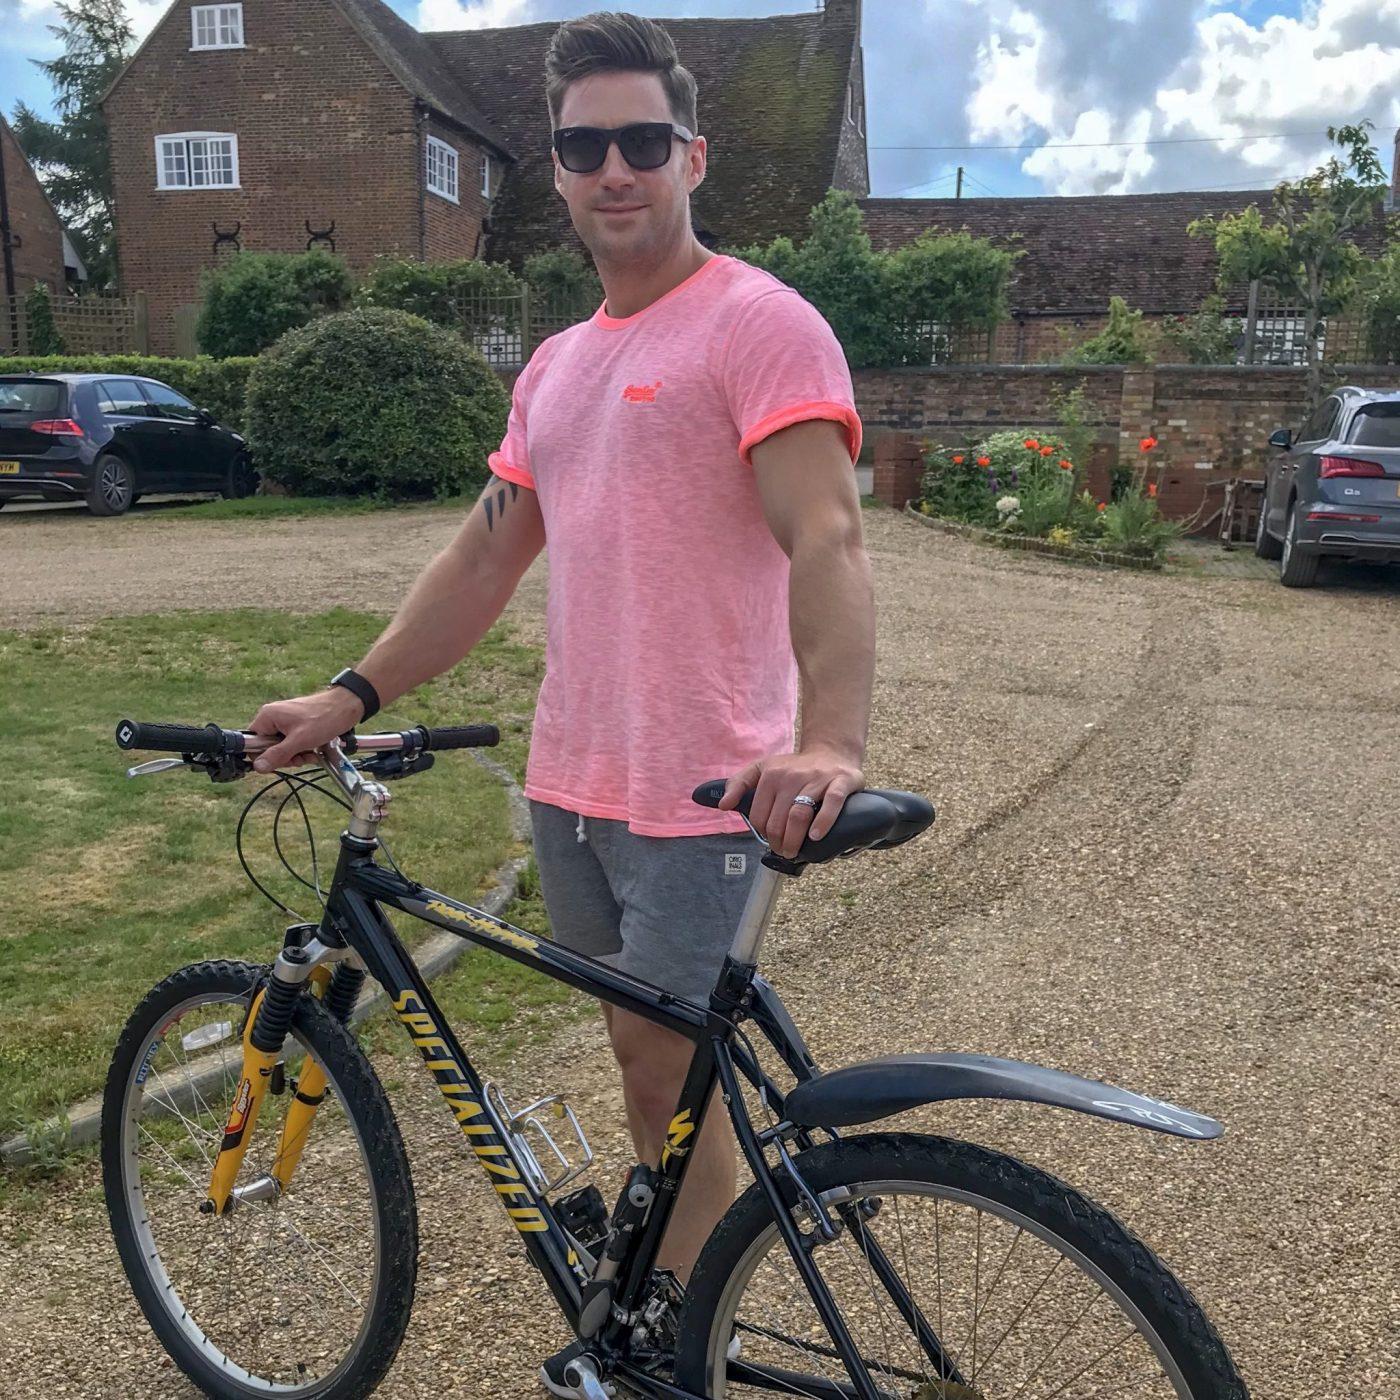 Getting Out the 19yo Bike